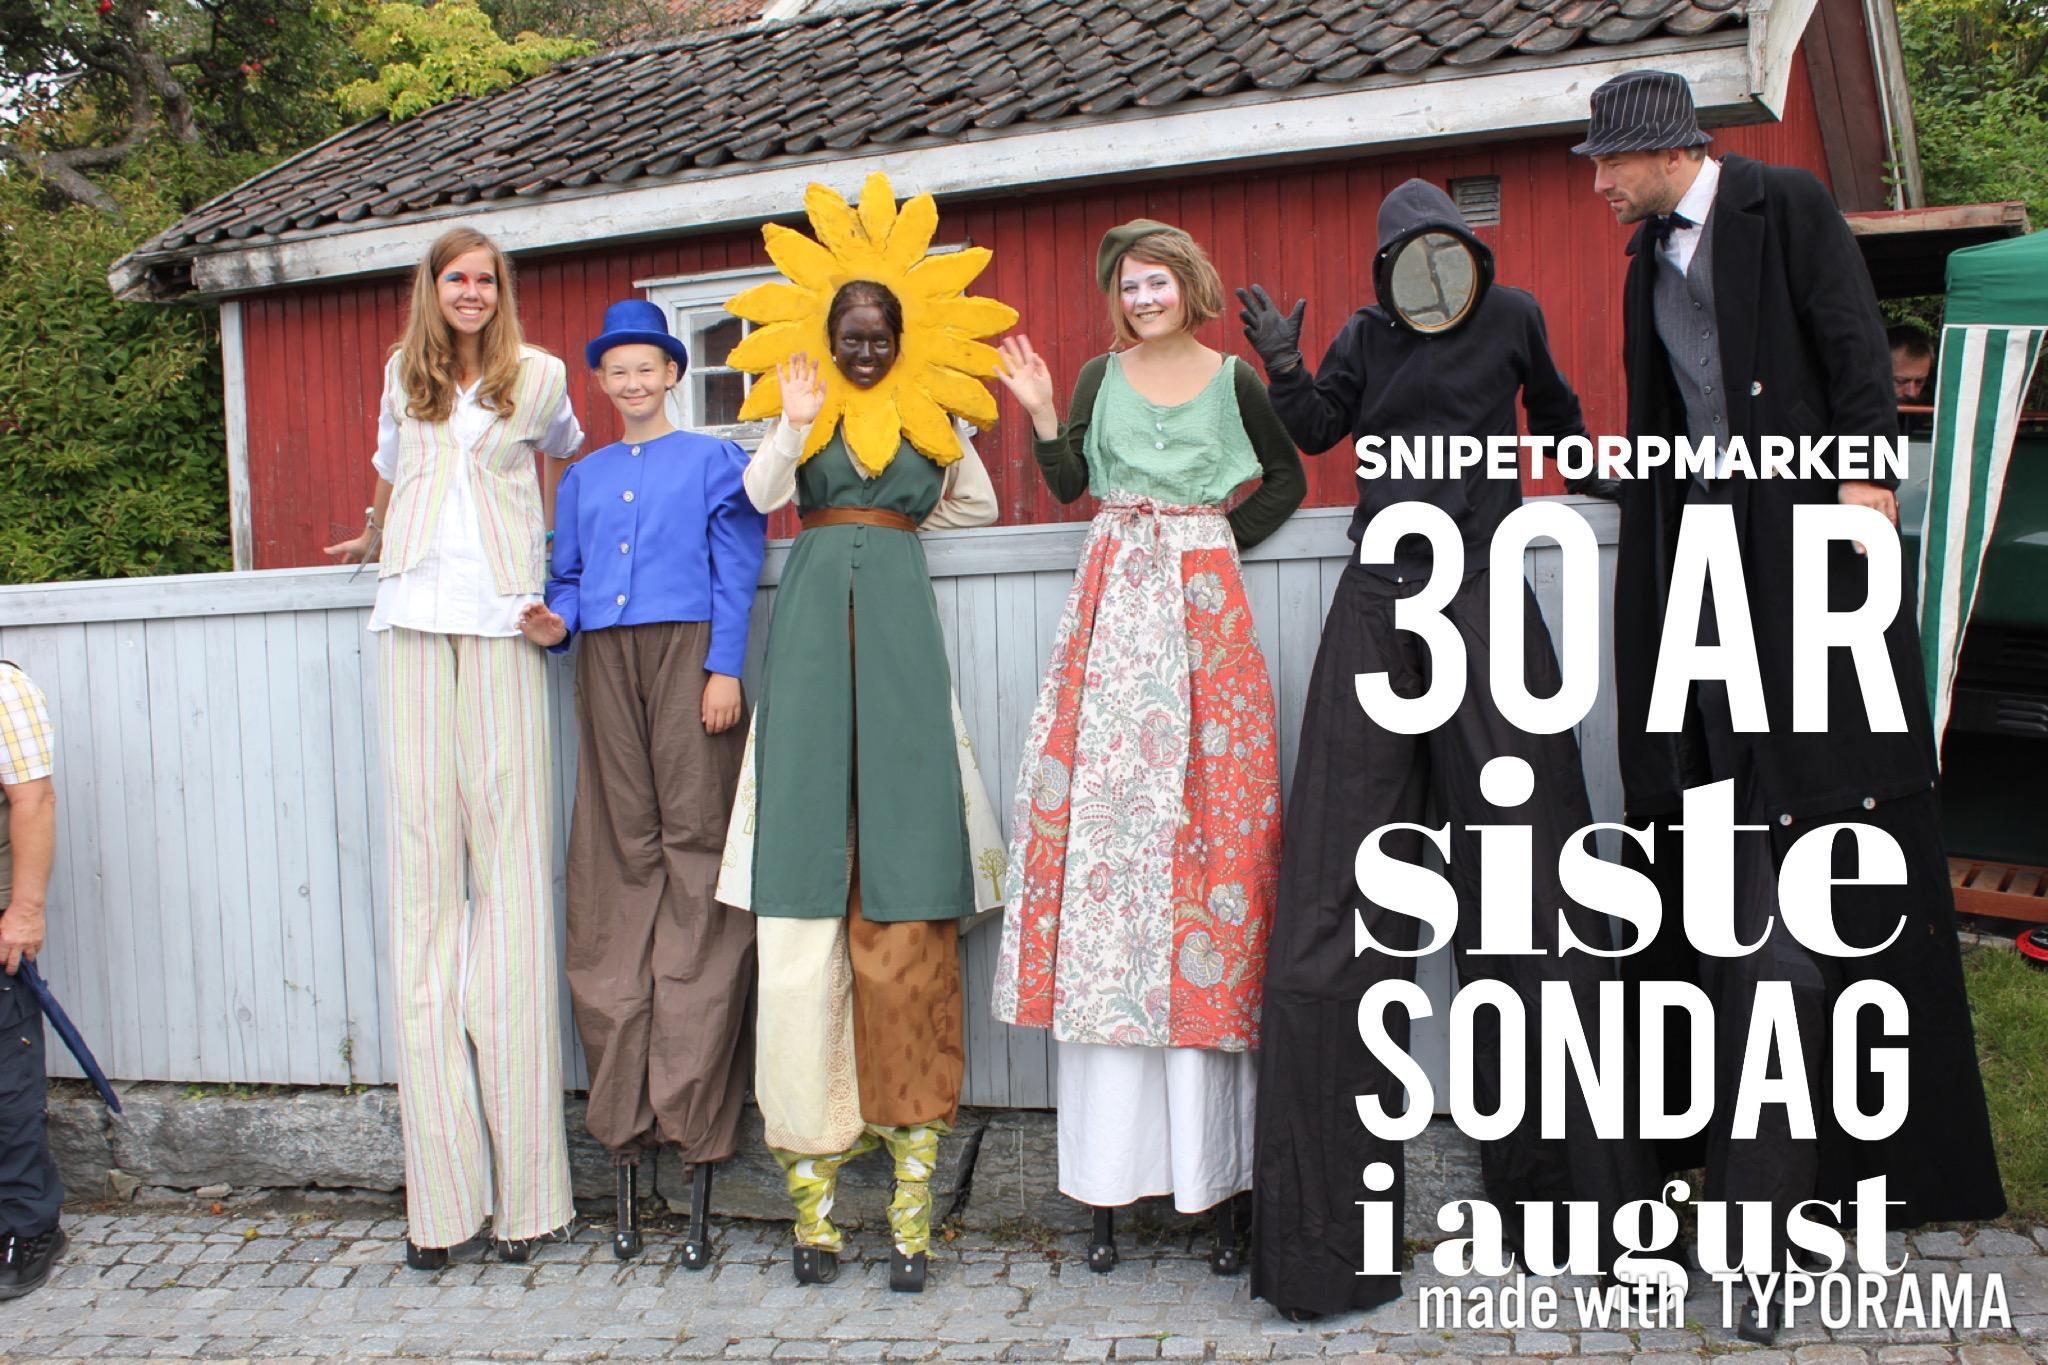 Snipetorpmarken siste søndag i august, © Snipetorp.no